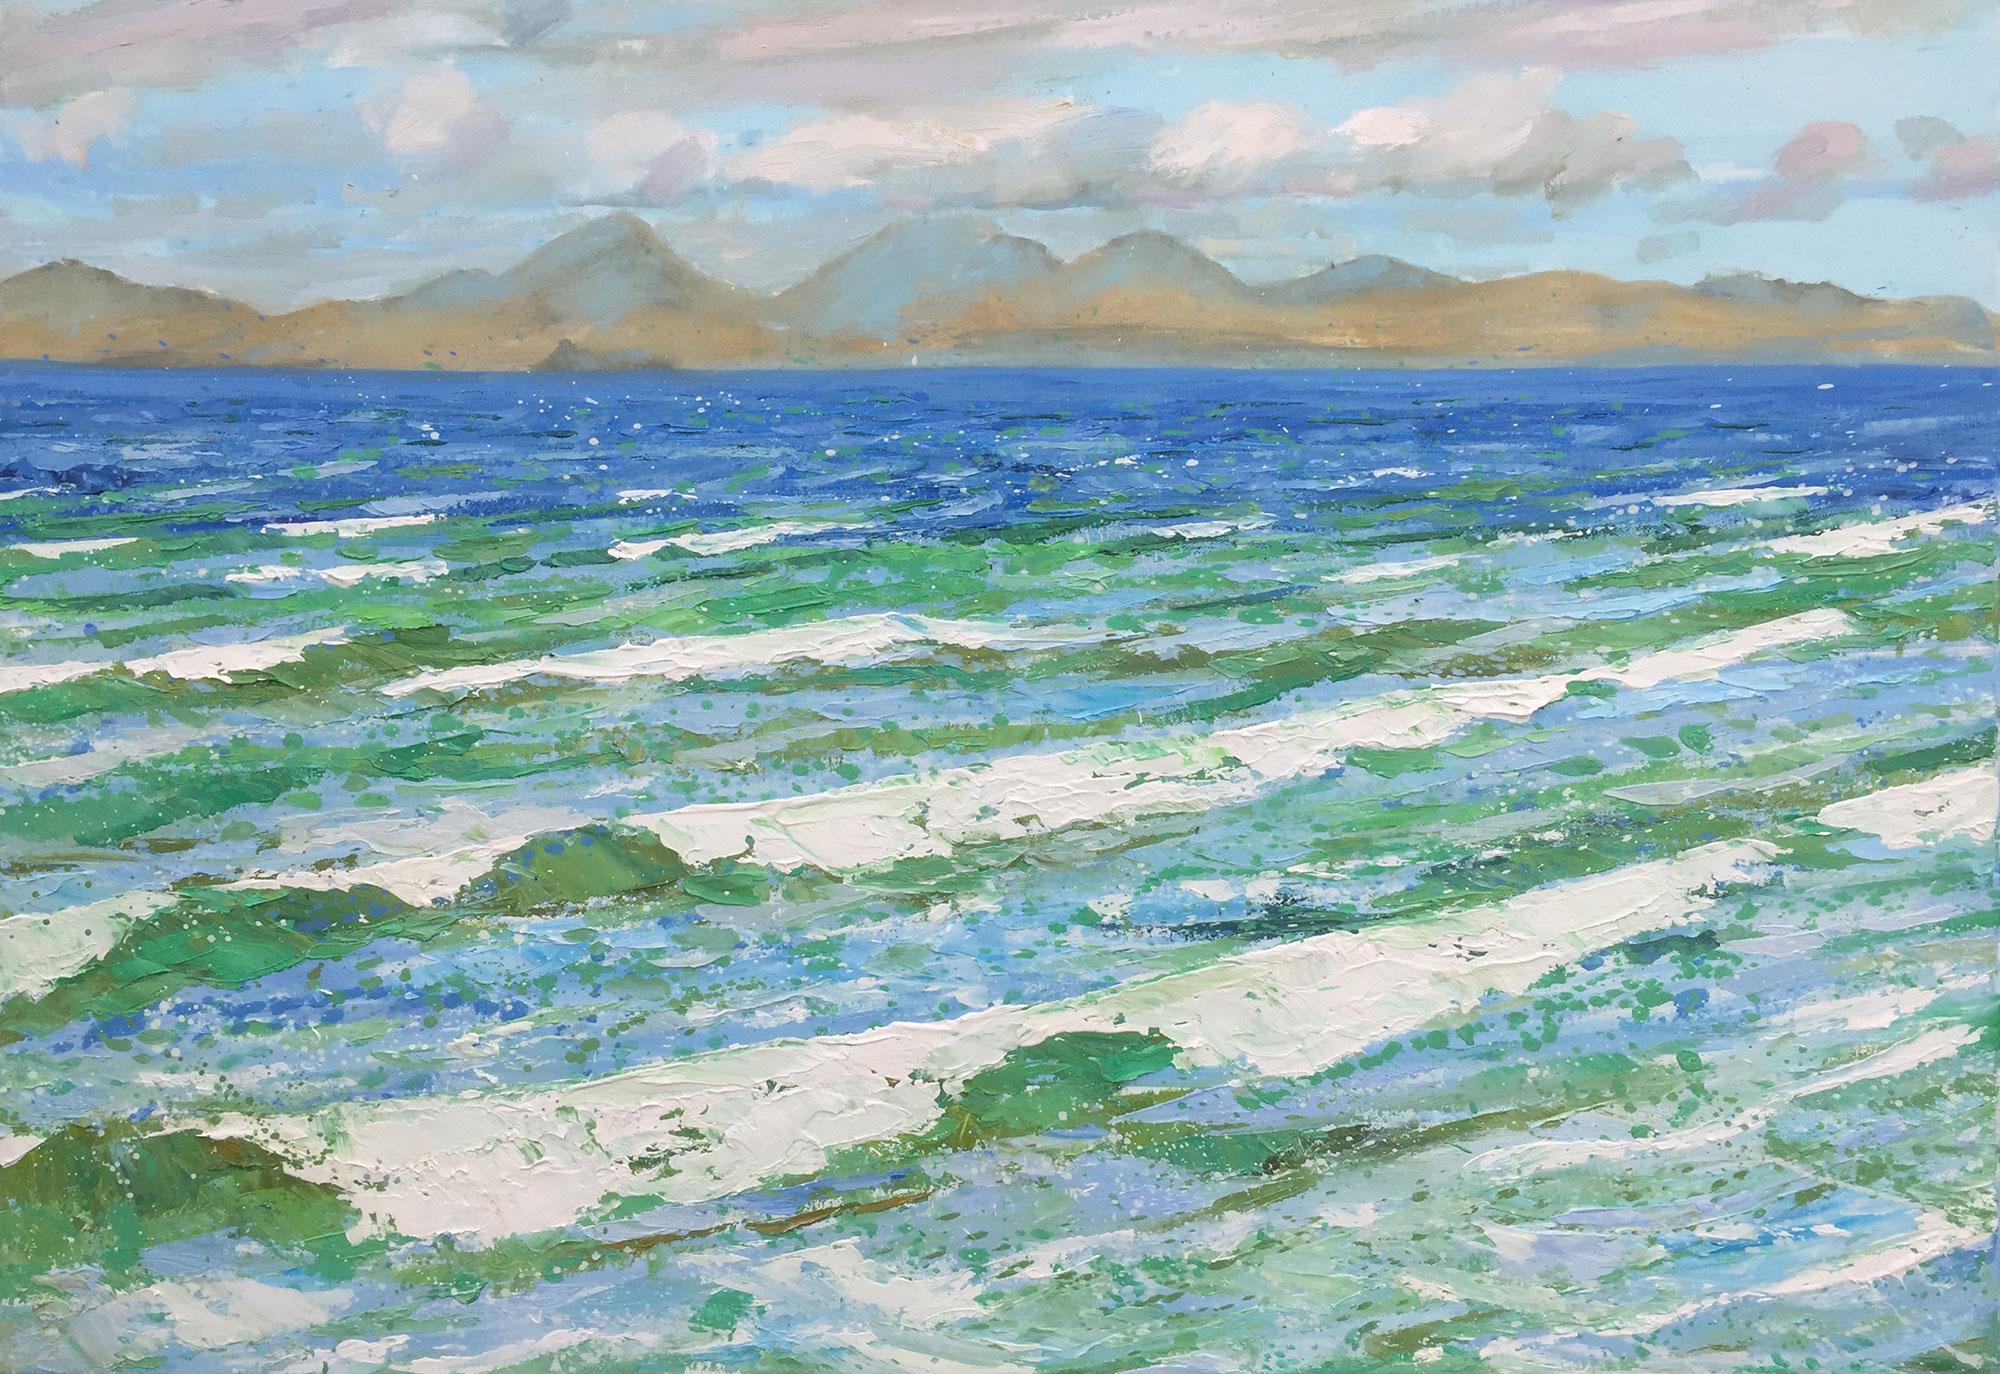 Robert Innes The Sound of Jura